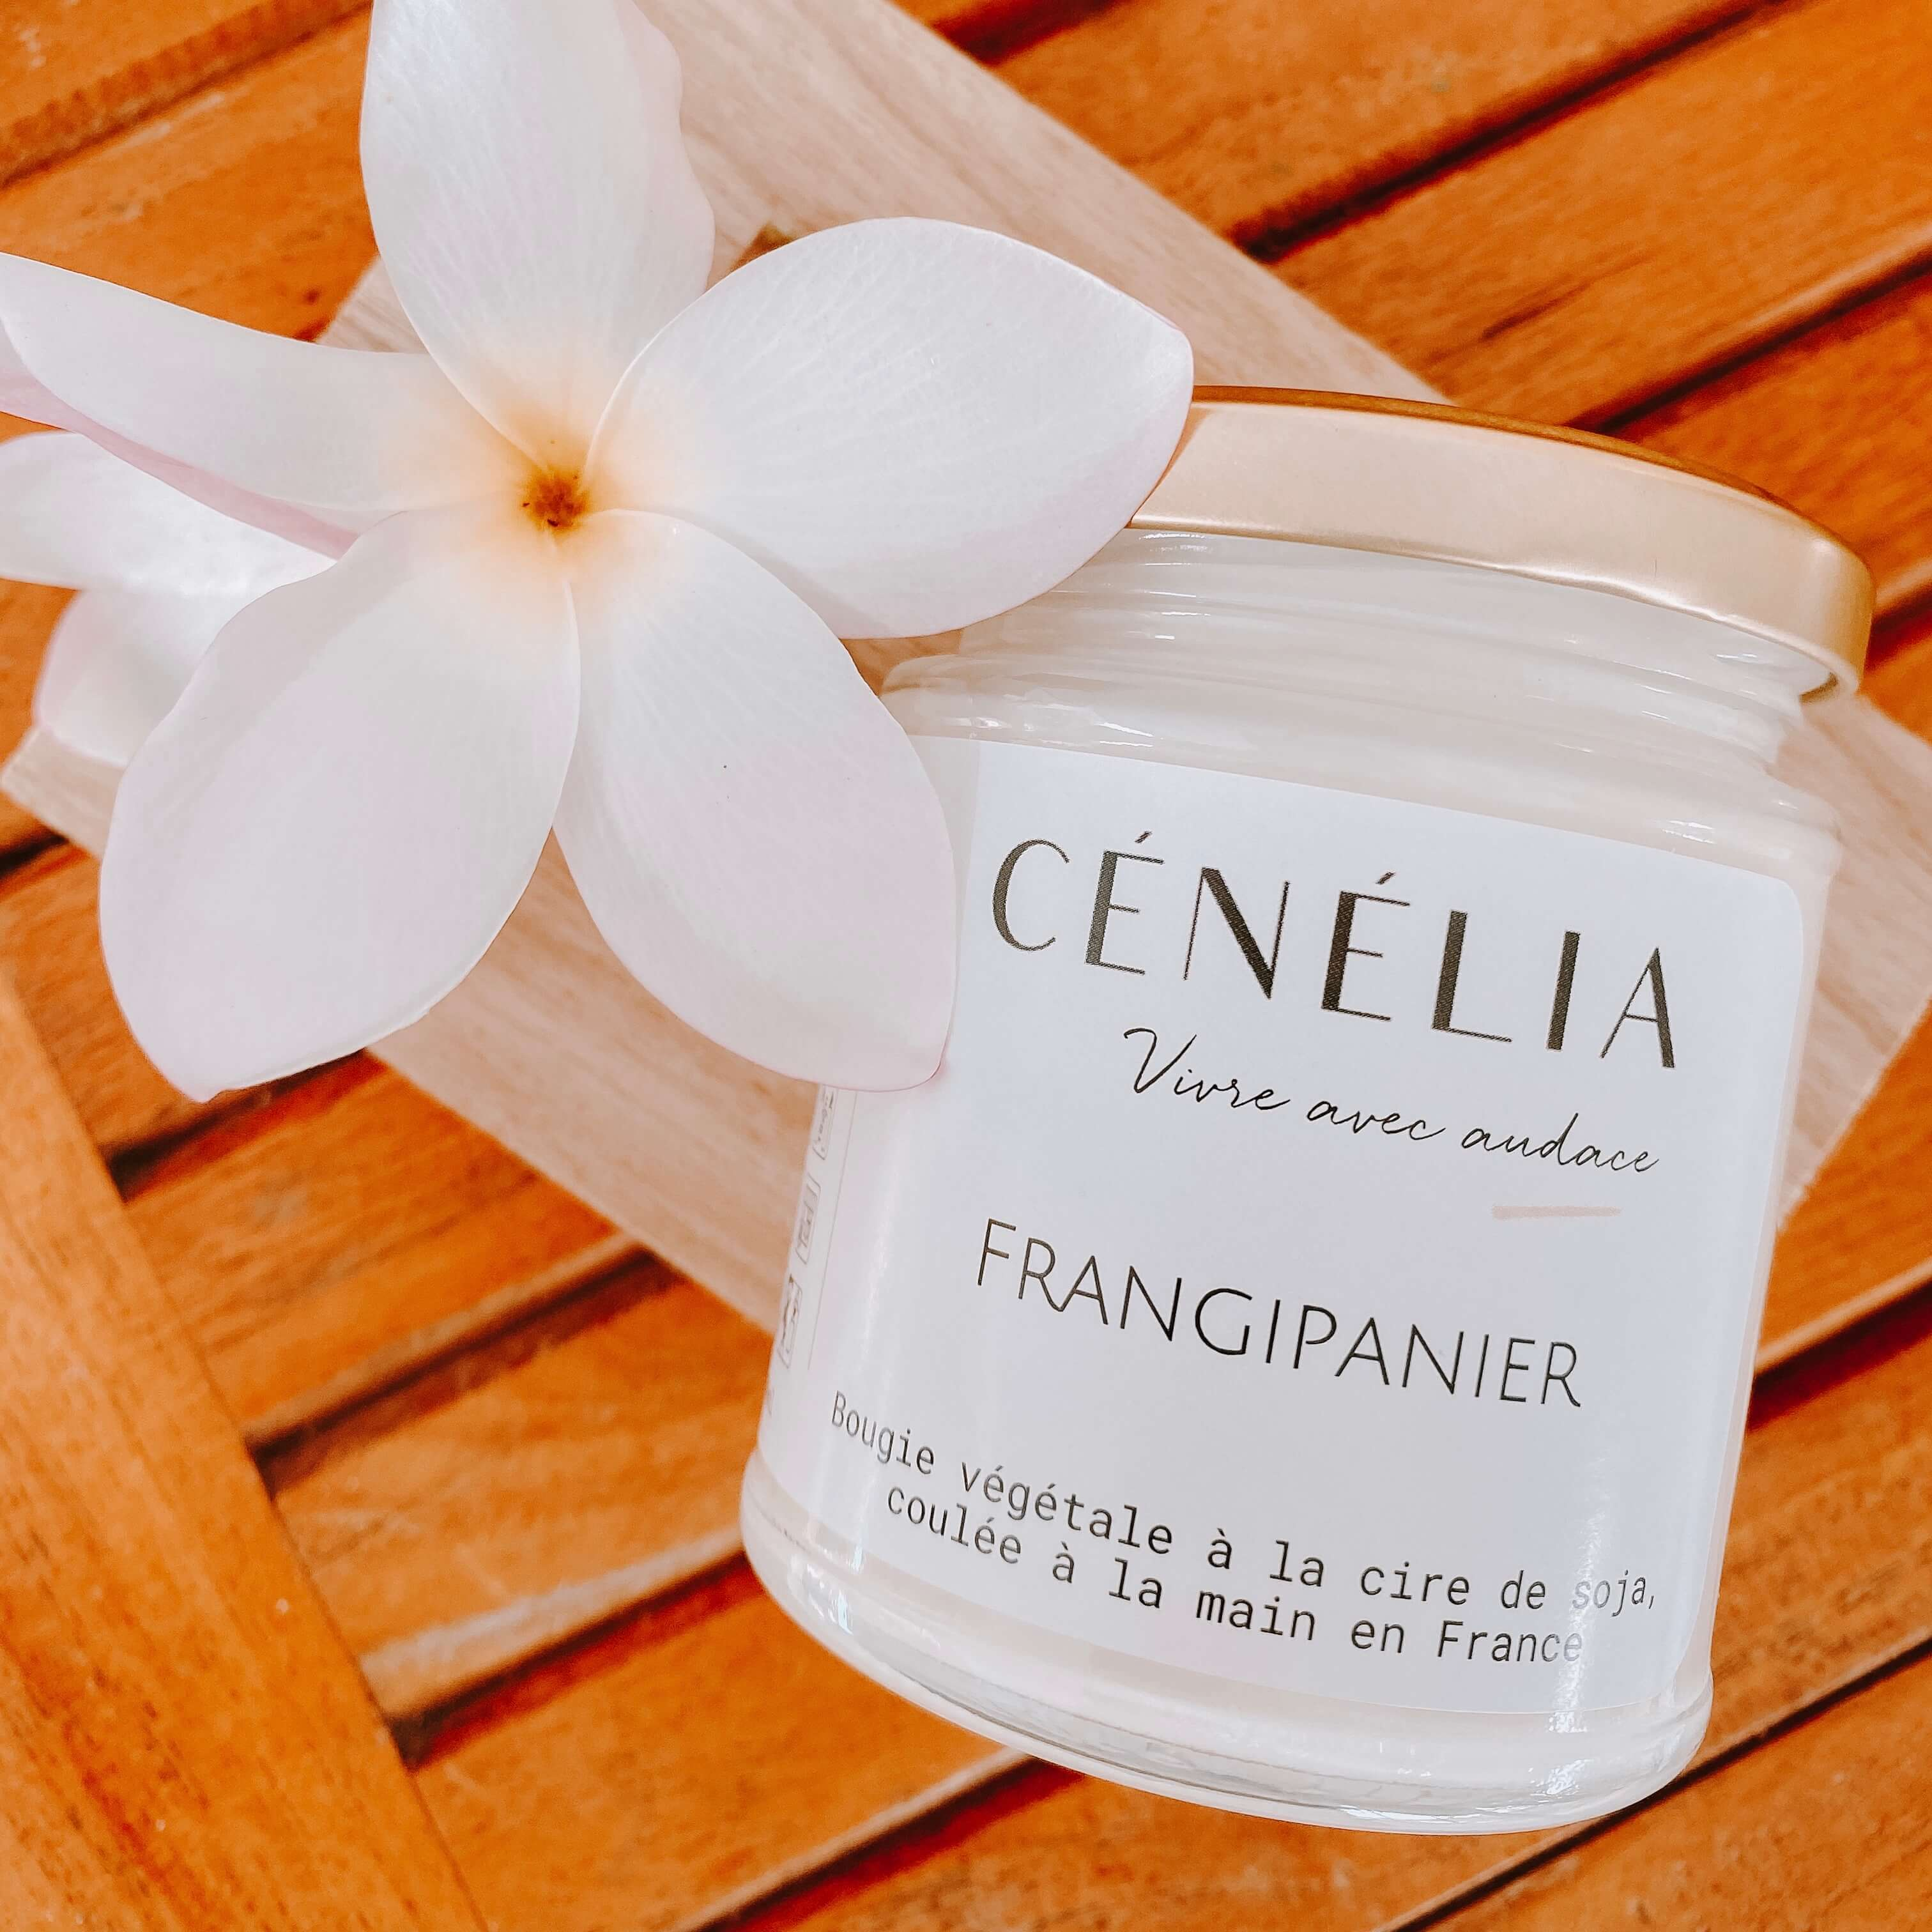 bougie végétale au frangipanier - Cénélia